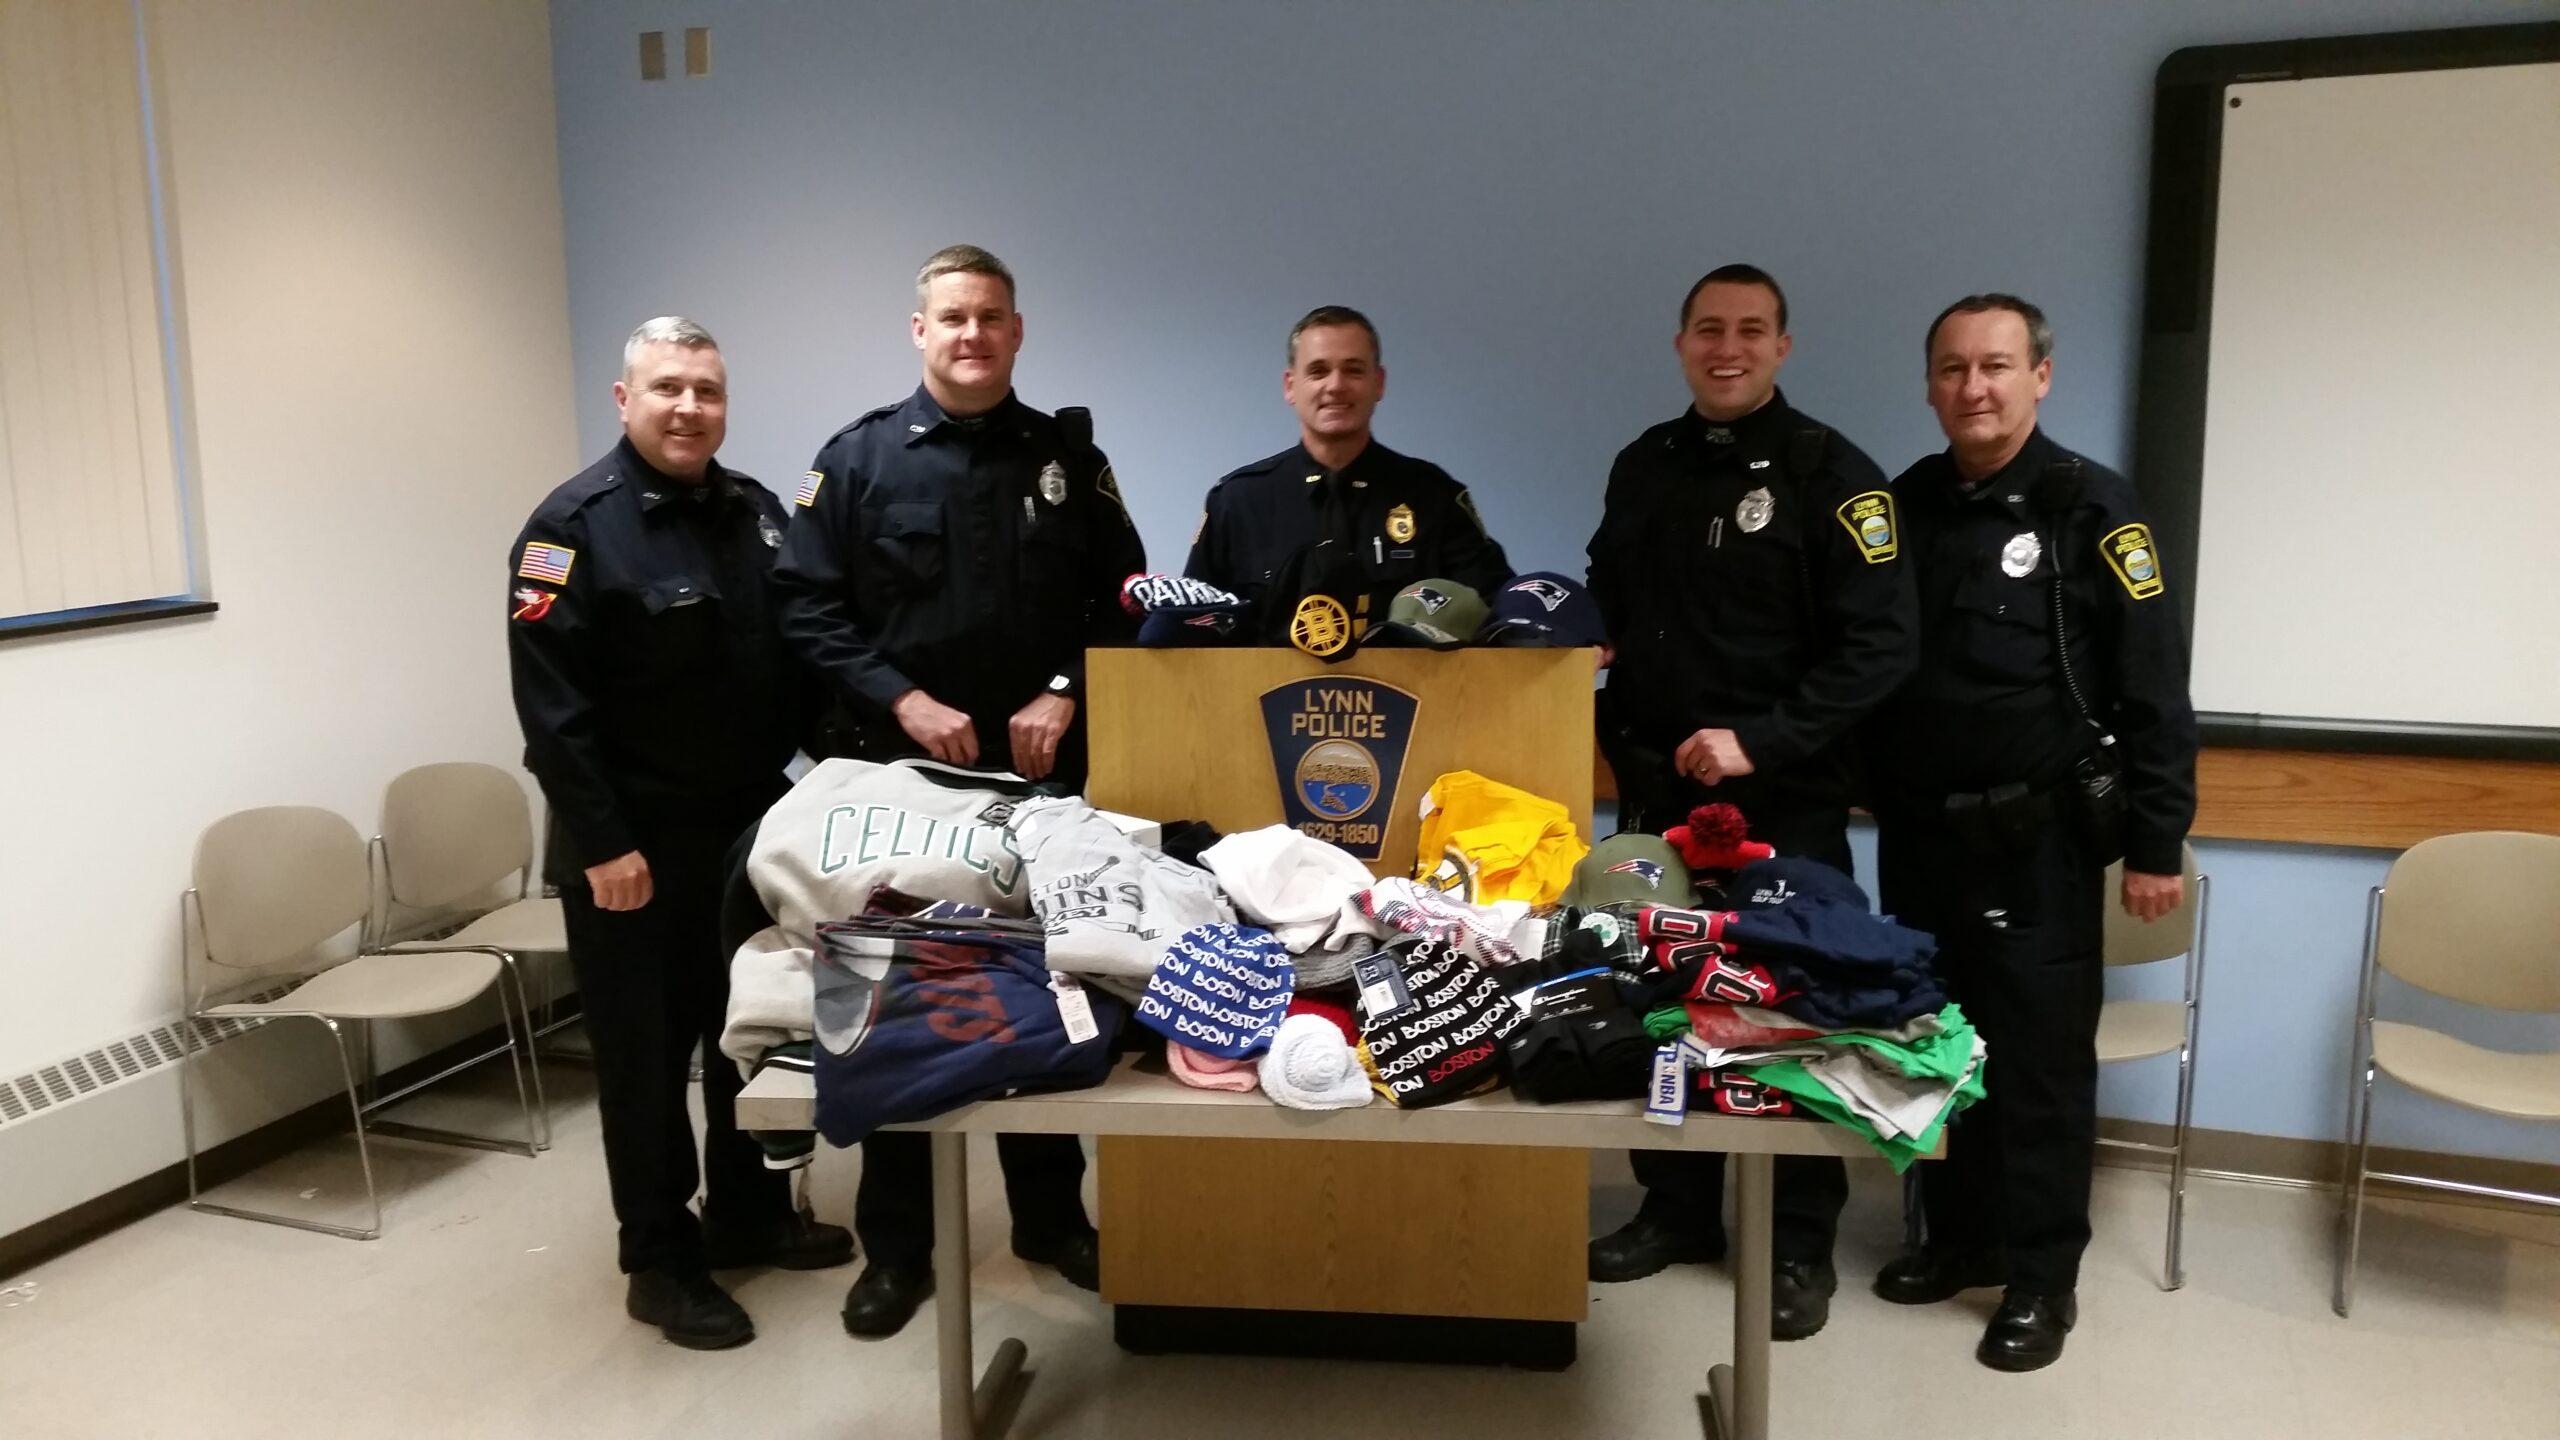 Lynn Police Association Joins Donation Efforts